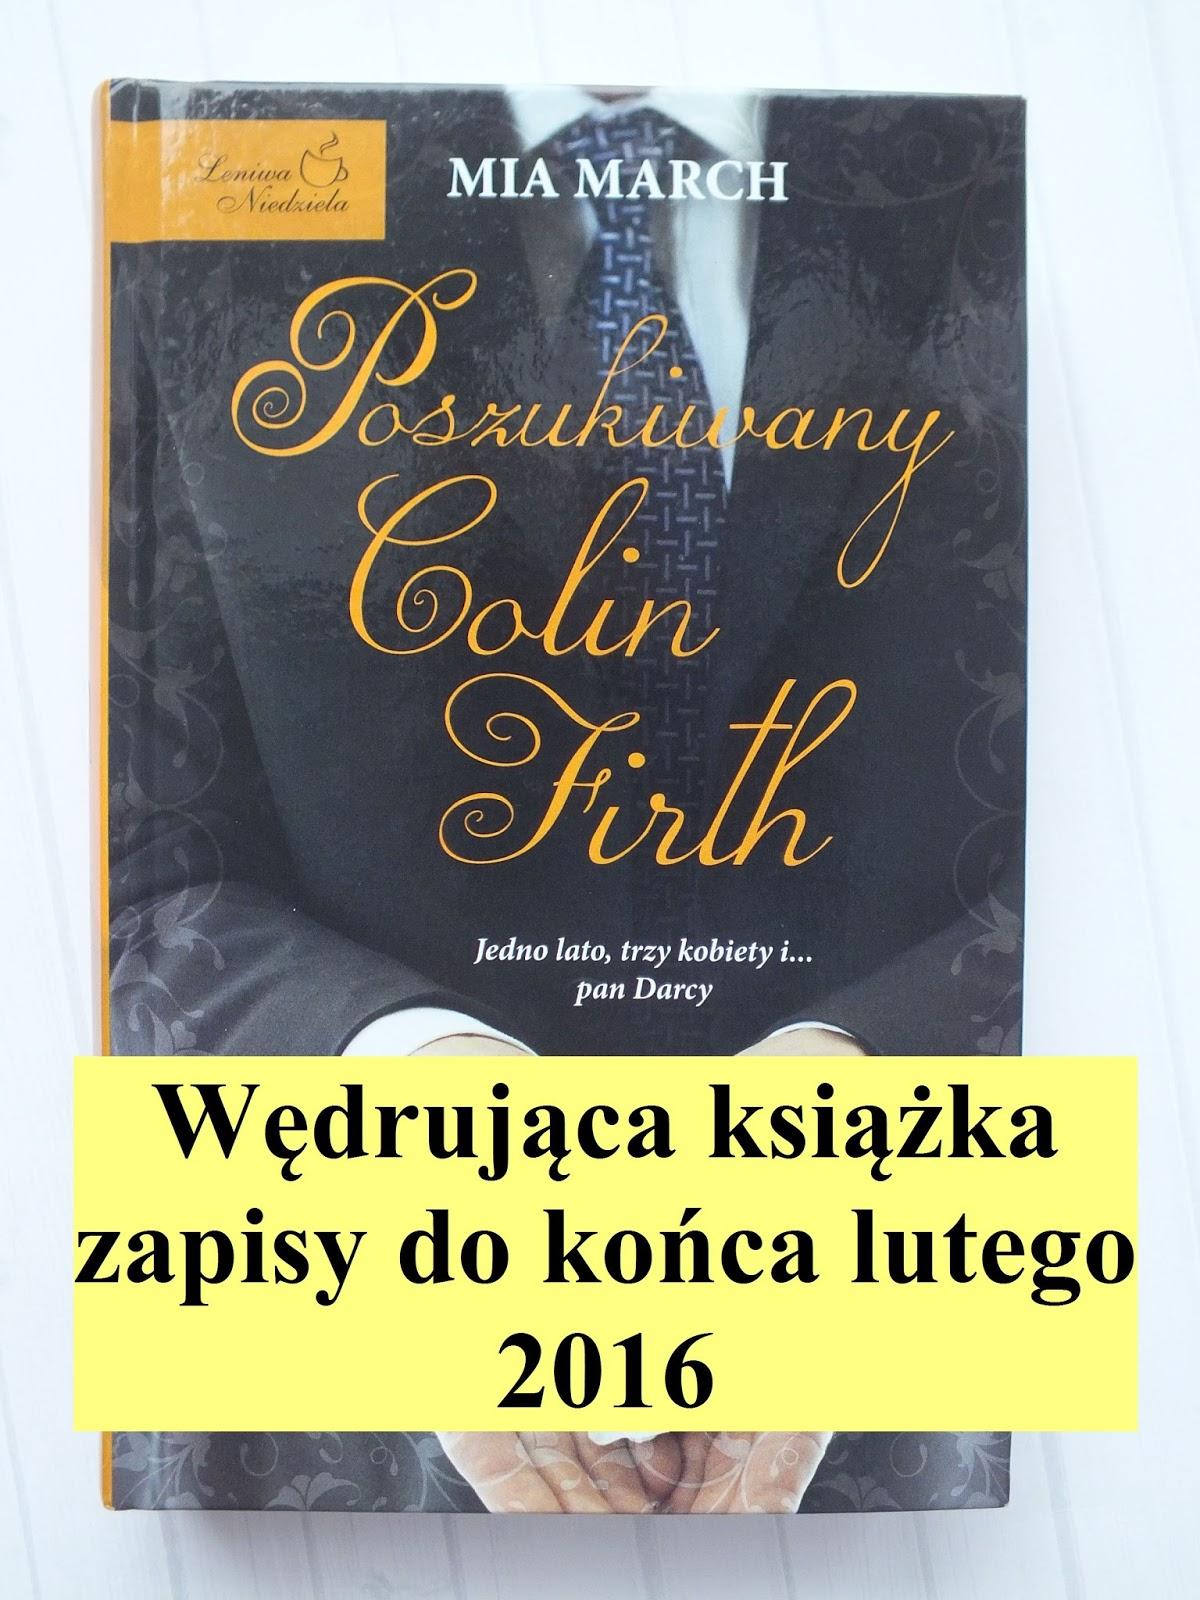 Wędrująca książka u CreaDiva